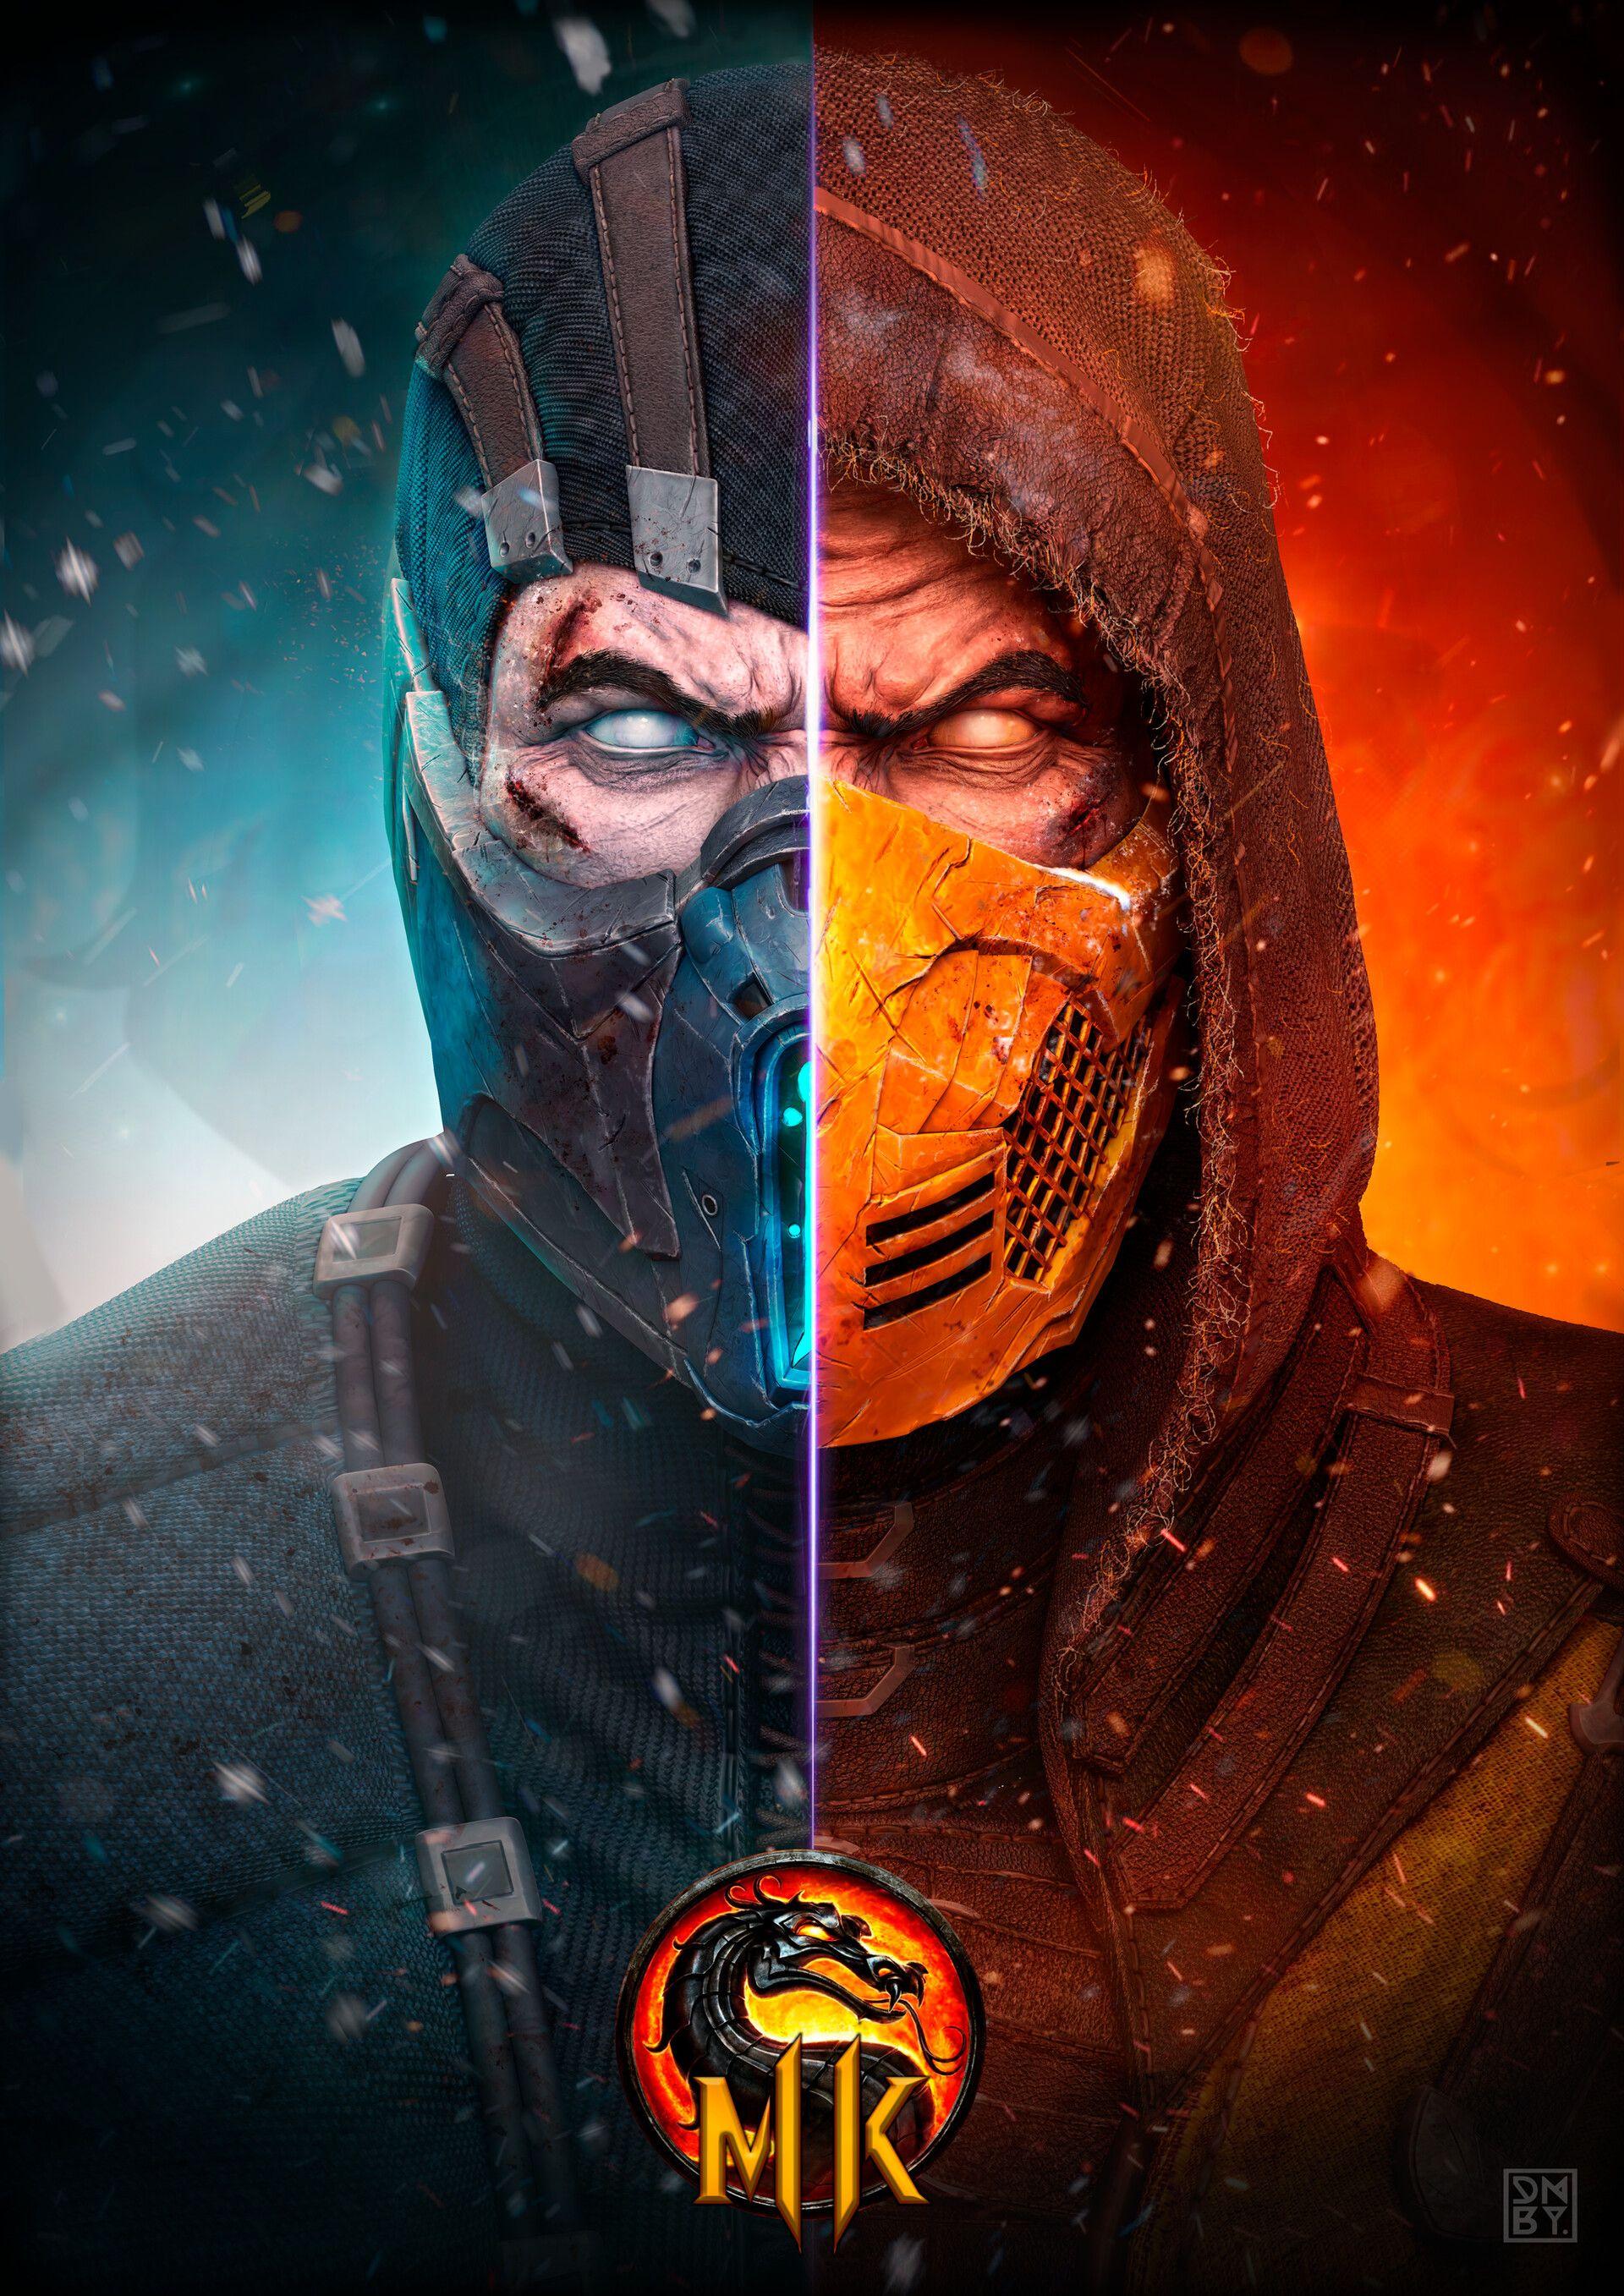 Mortal Kombat Movie 2021 Poster / Mortal Kombat Watch ...